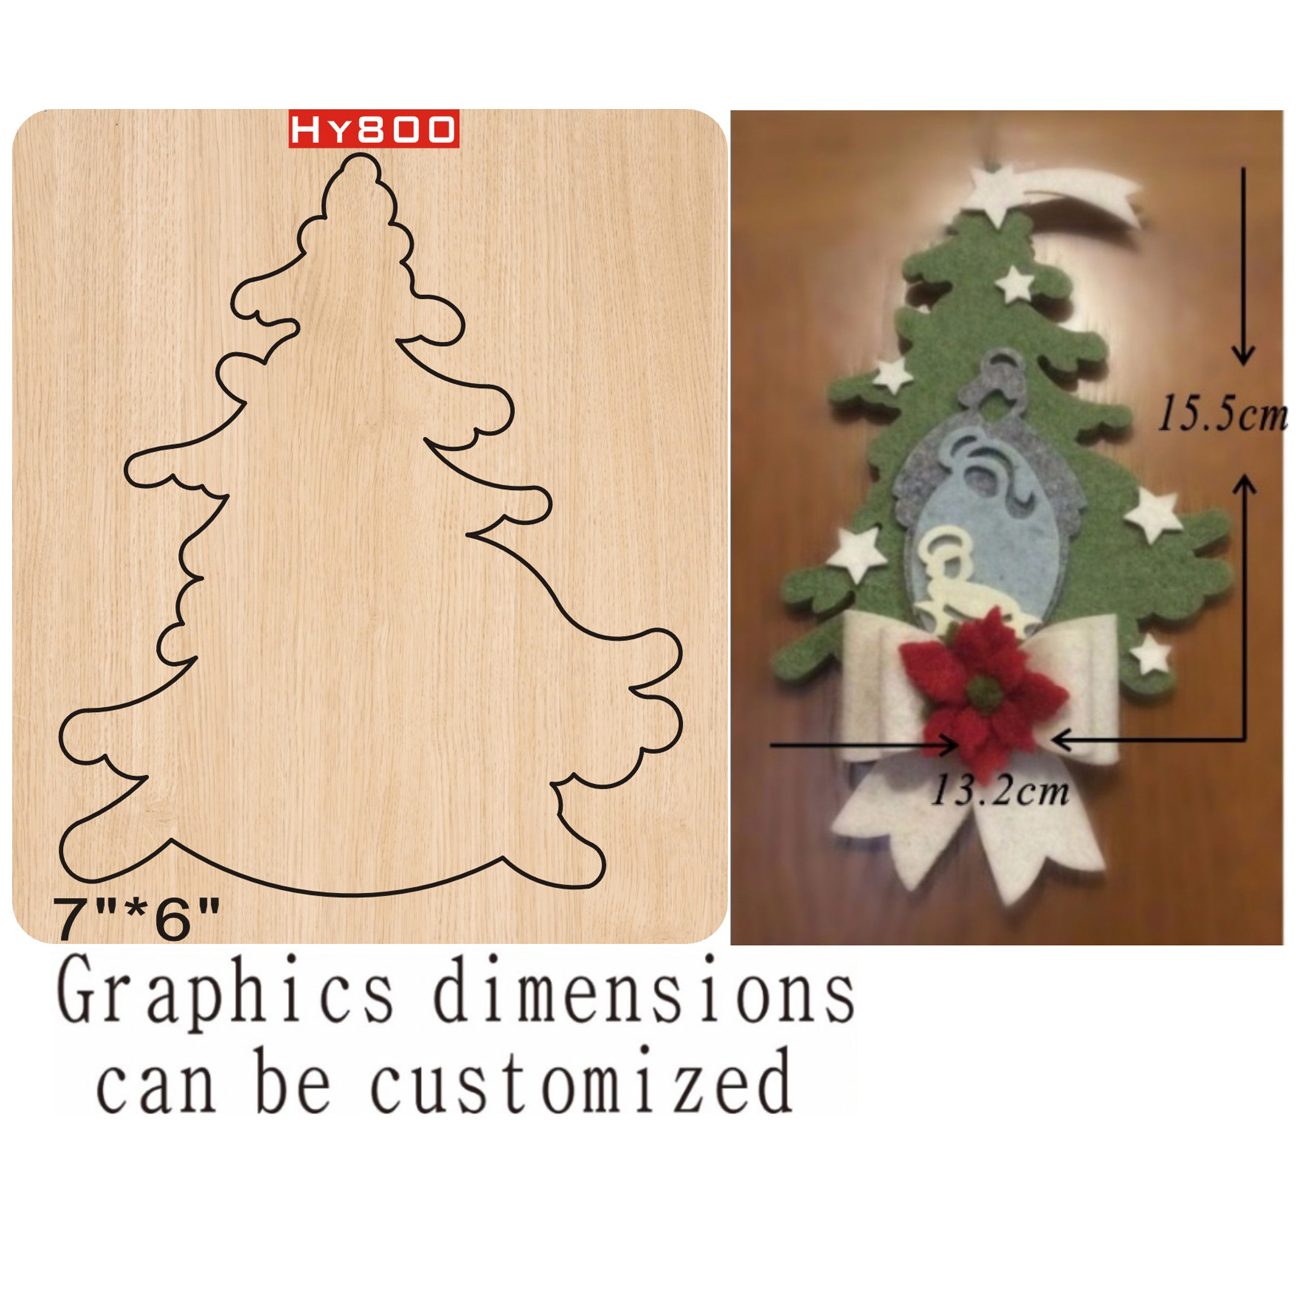 Tree  Cutting Dies 2019 Die Cut & Wooden Dies Suitable  For Common Die Cutting  Machines On The Market